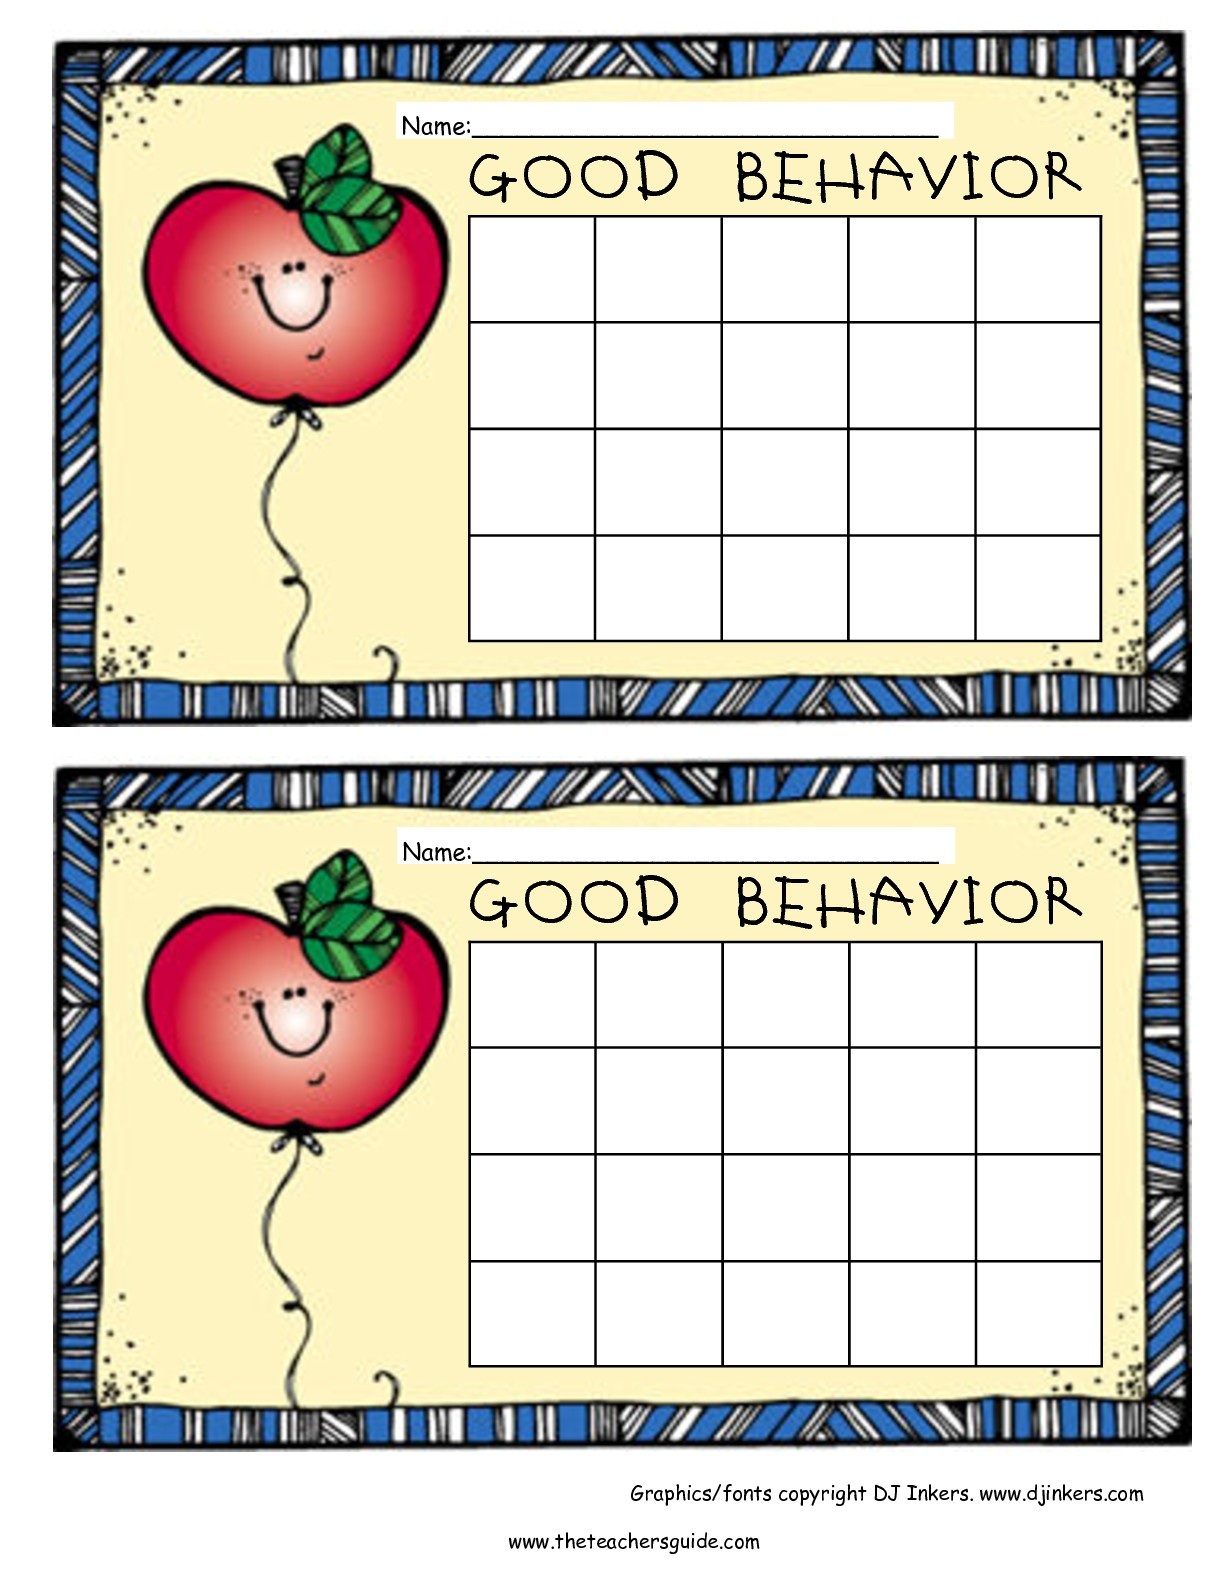 Free Printable Reward And Incentive Charts pertaining to Free Printable Behavior Chart Templates